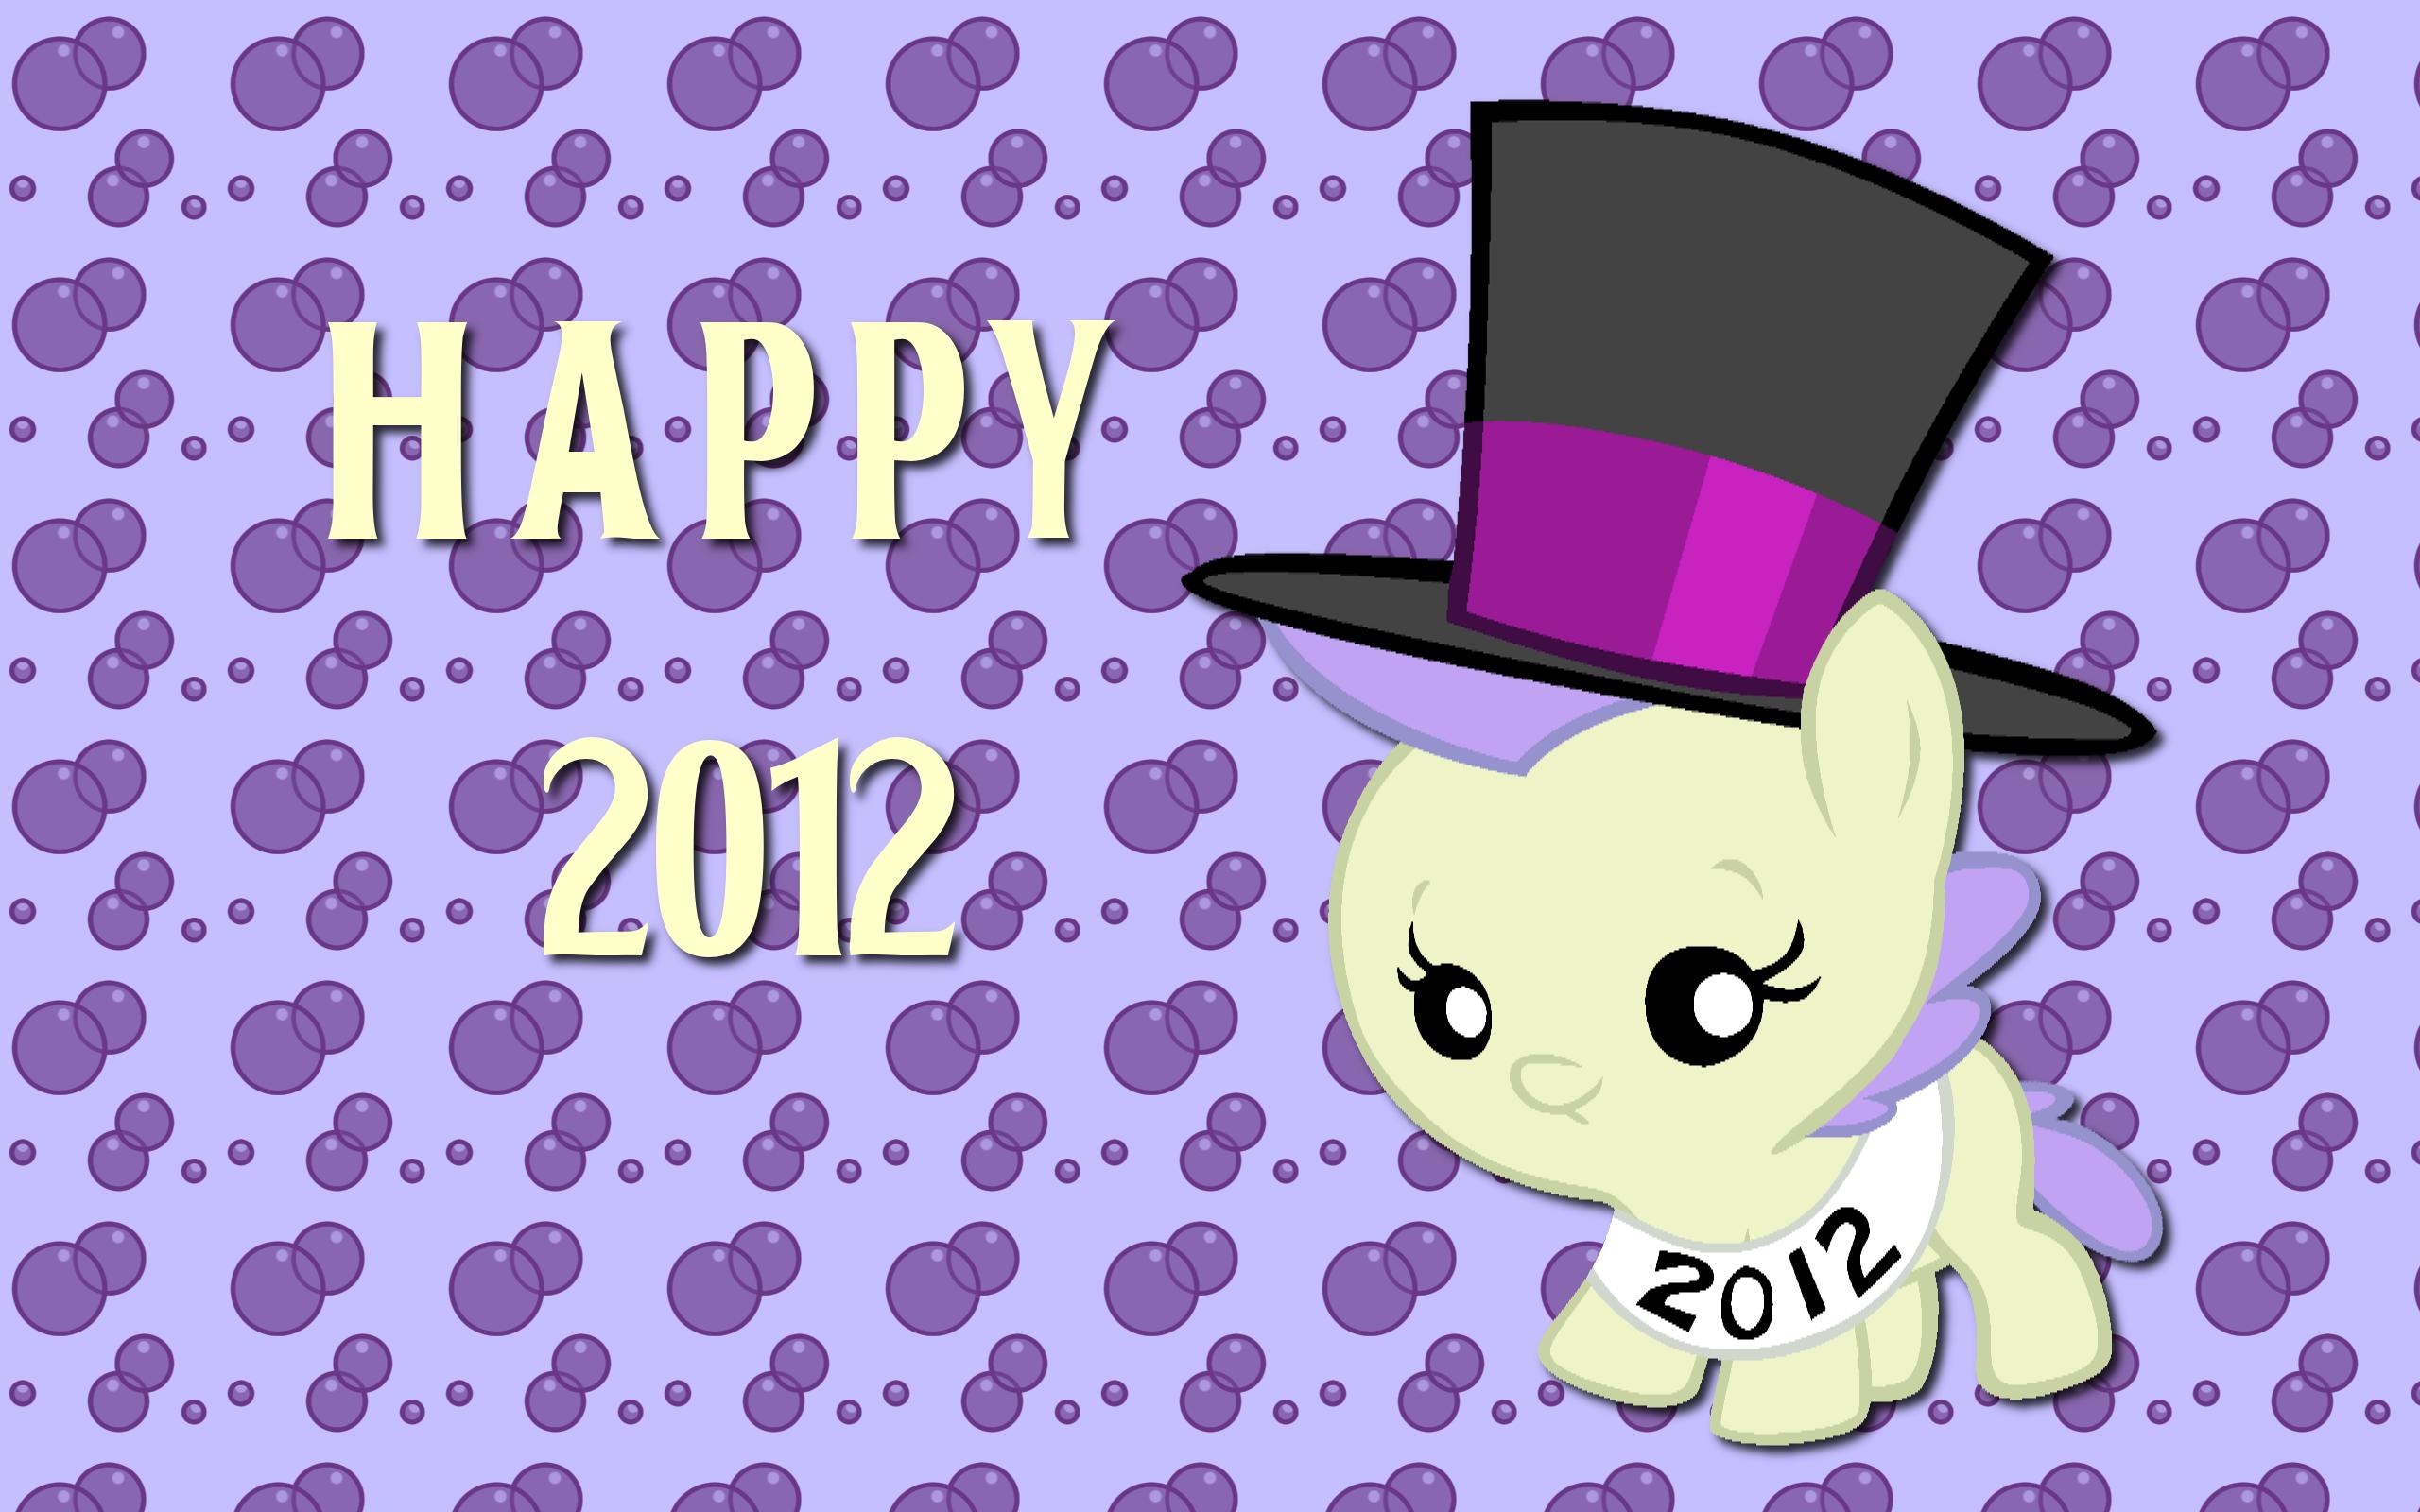 Happy 2012 Cream Puff WP by AliceHumanSacrifice0 and Bronyboy